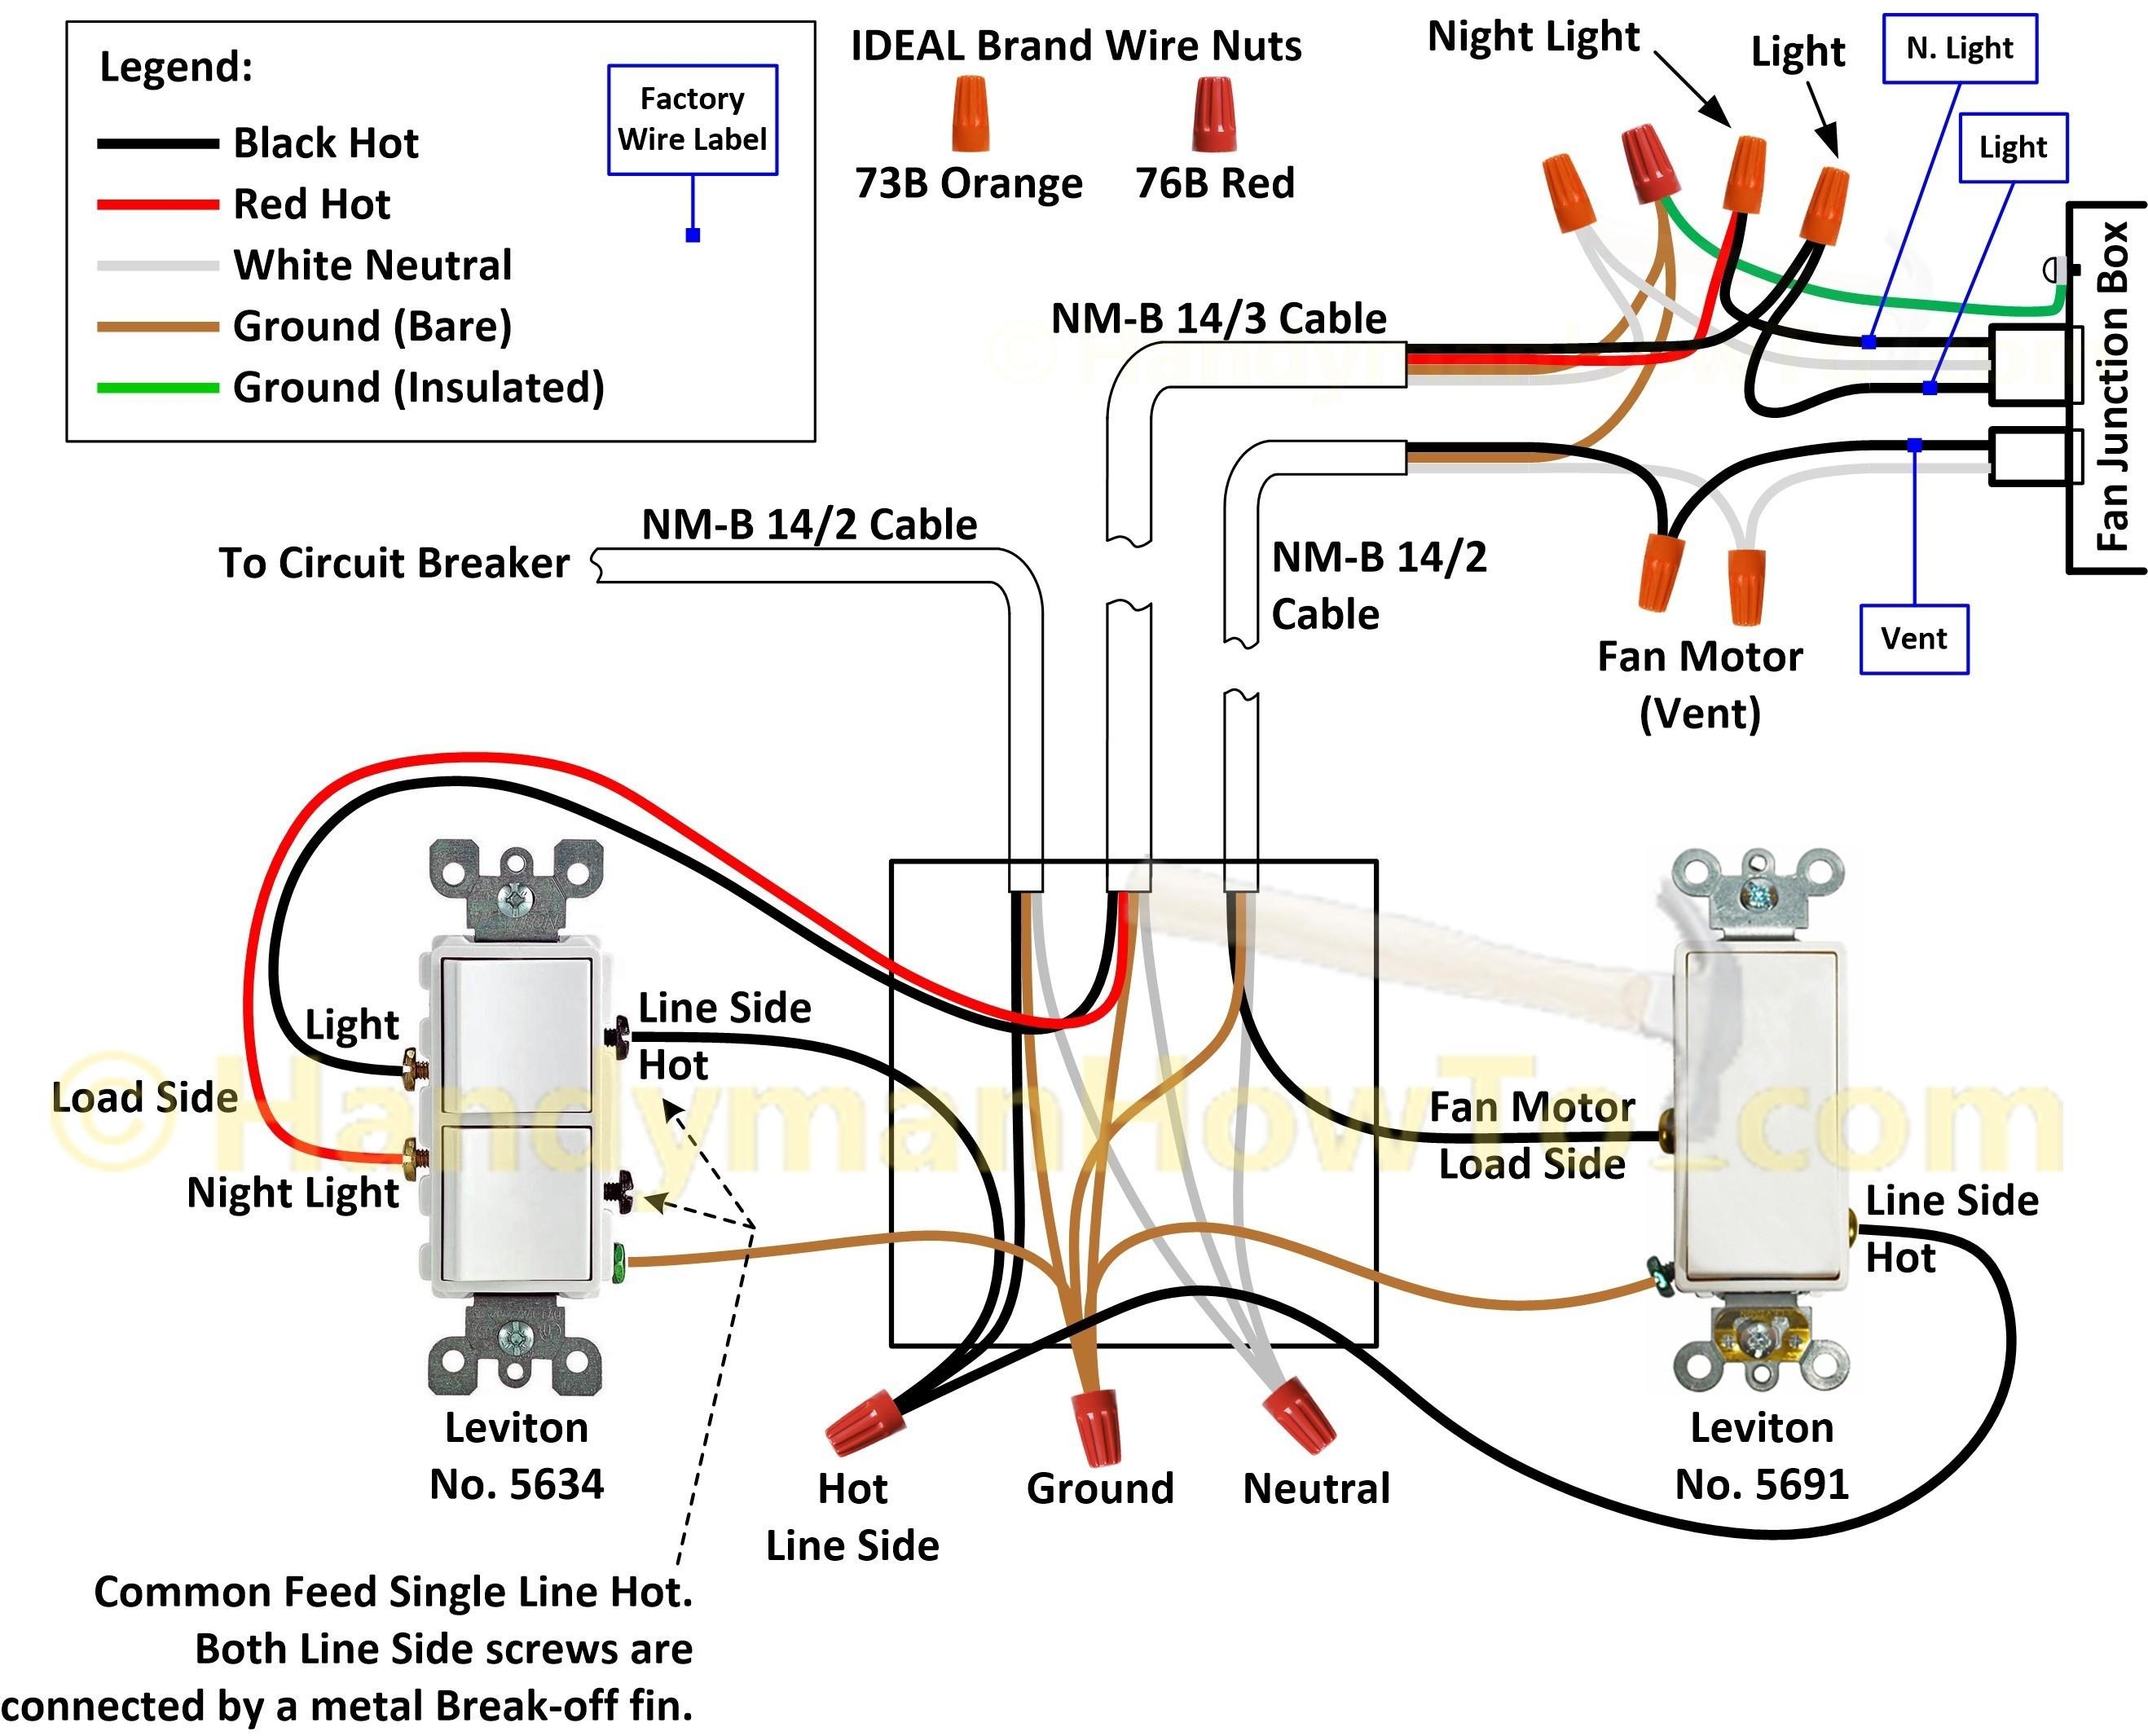 Klipsch Promedia 2 1 Wiring Diagram Multiple Amplifier Wiring Diagram New How to Wire Multiple Lights E Of Klipsch Promedia 2 1 Wiring Diagram